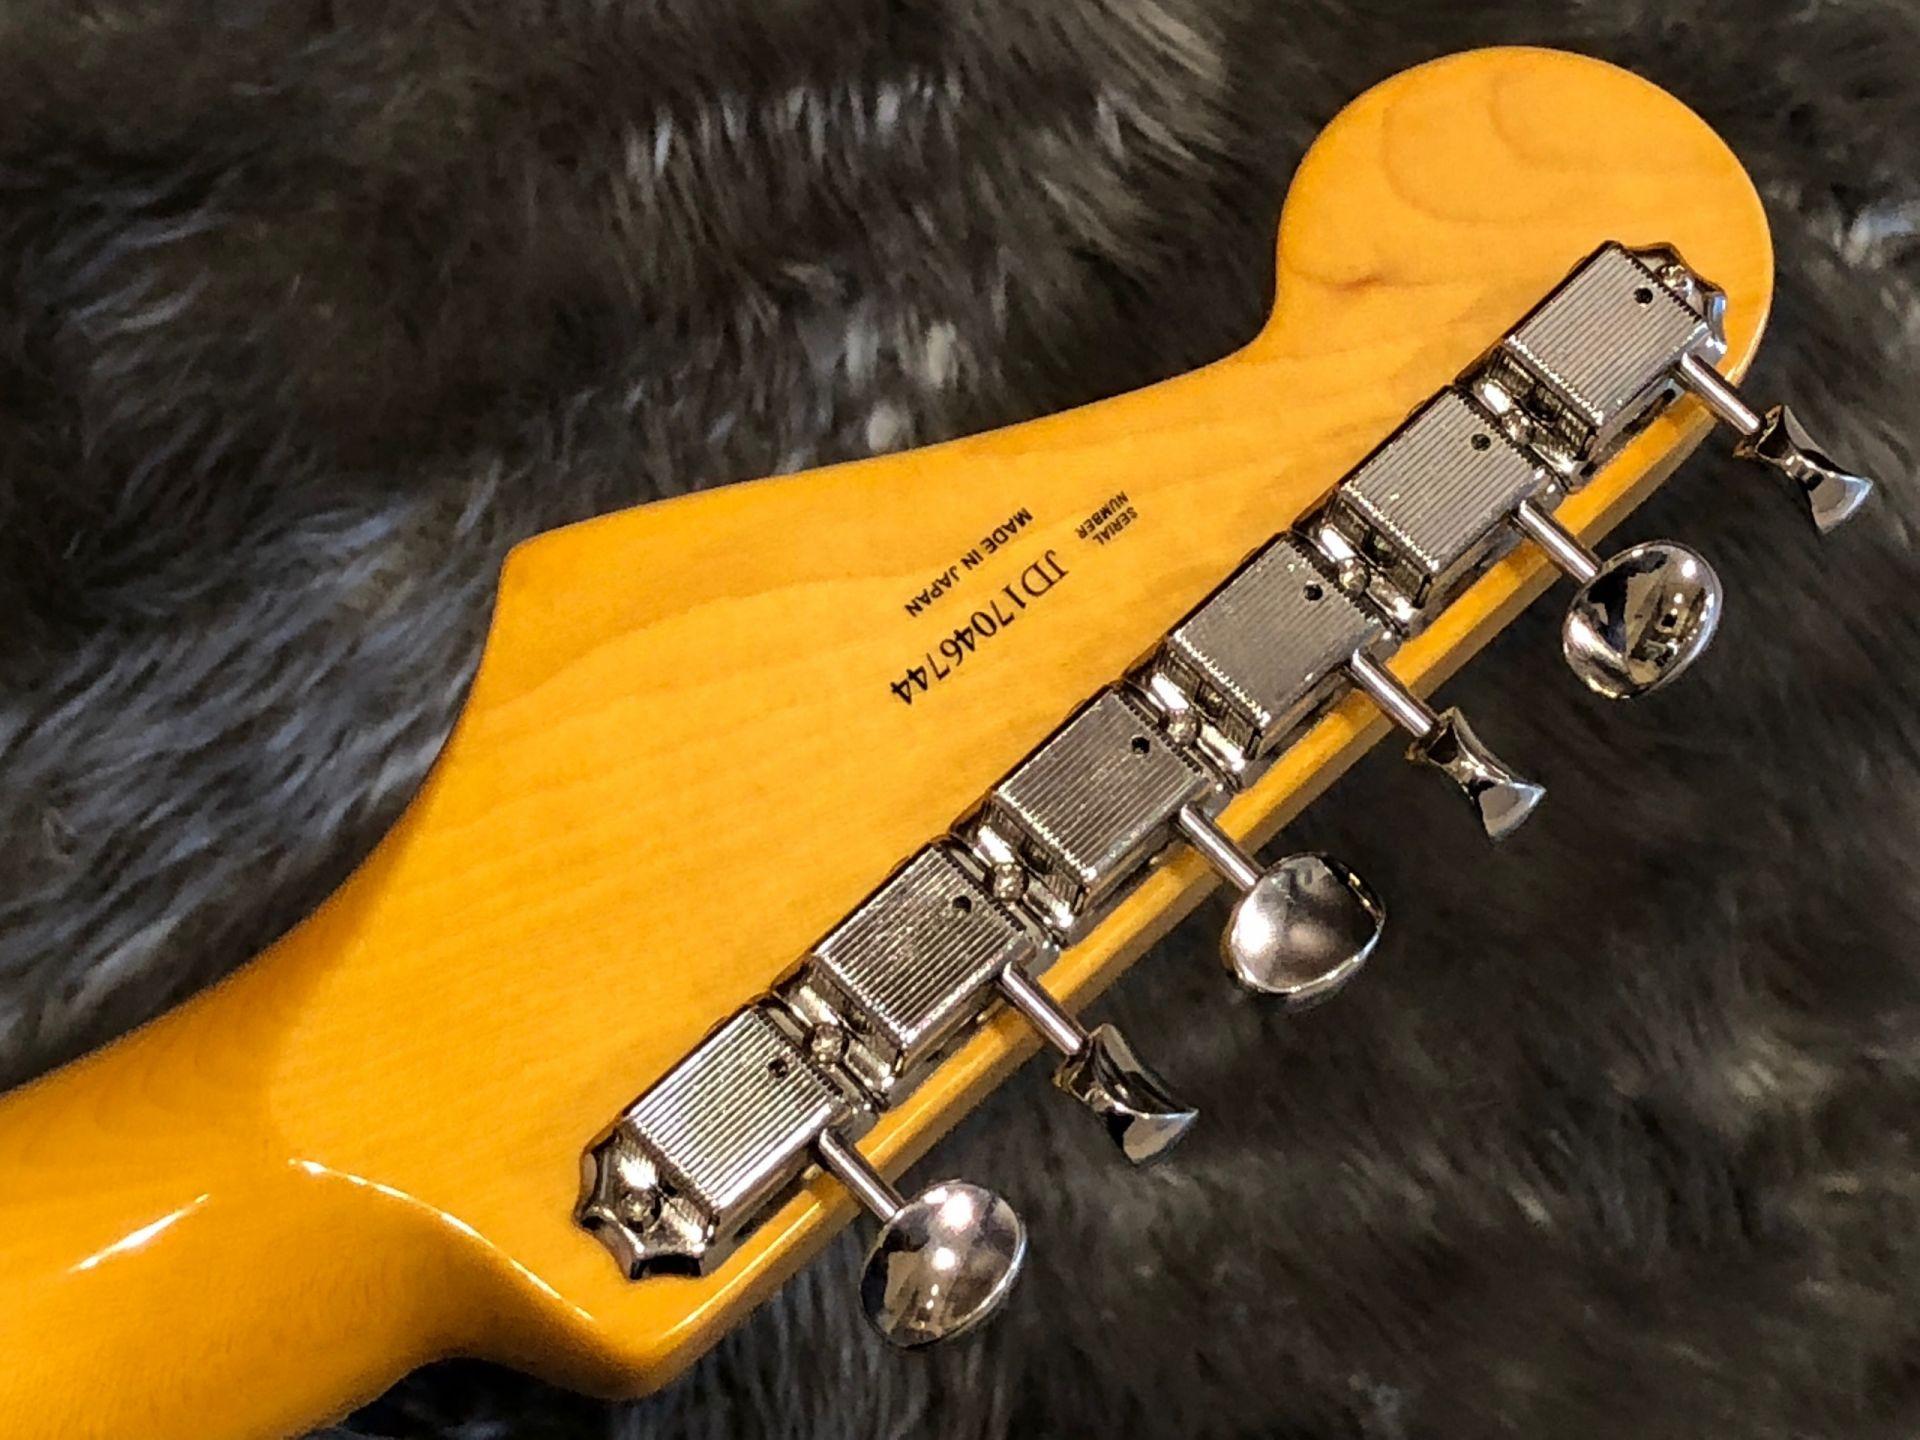 MIJ Traditional 50s Stratocasterのヘッド裏-アップ画像